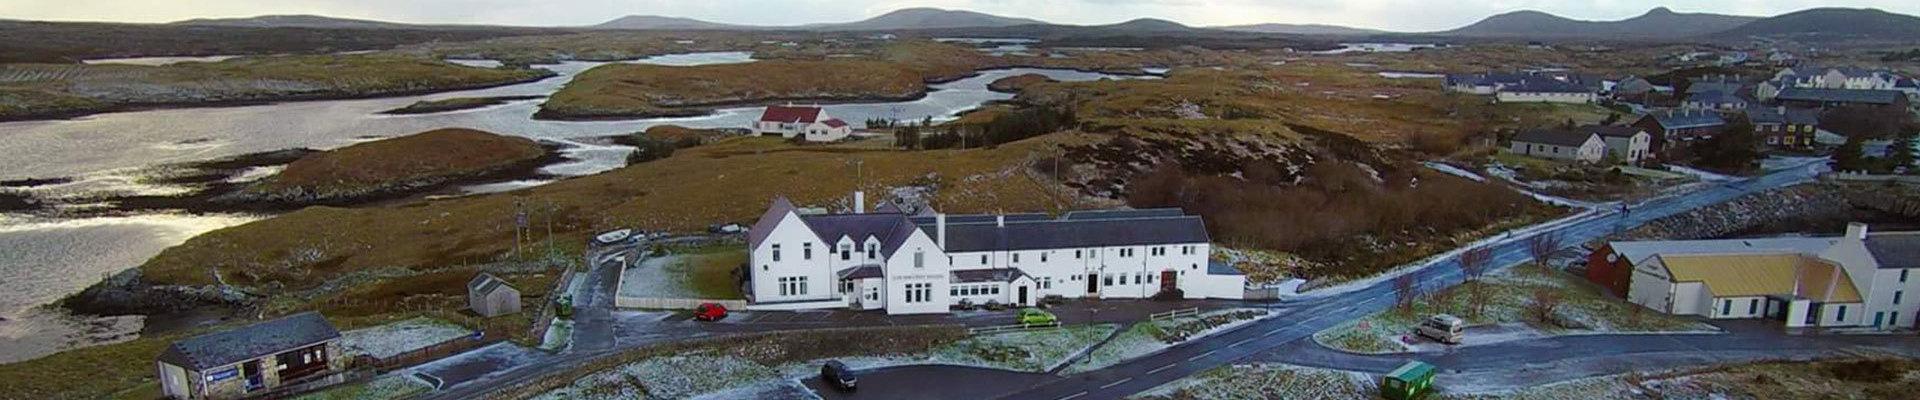 Hotel Lochmaddy, Hotel North Uist, Fishing North Uist